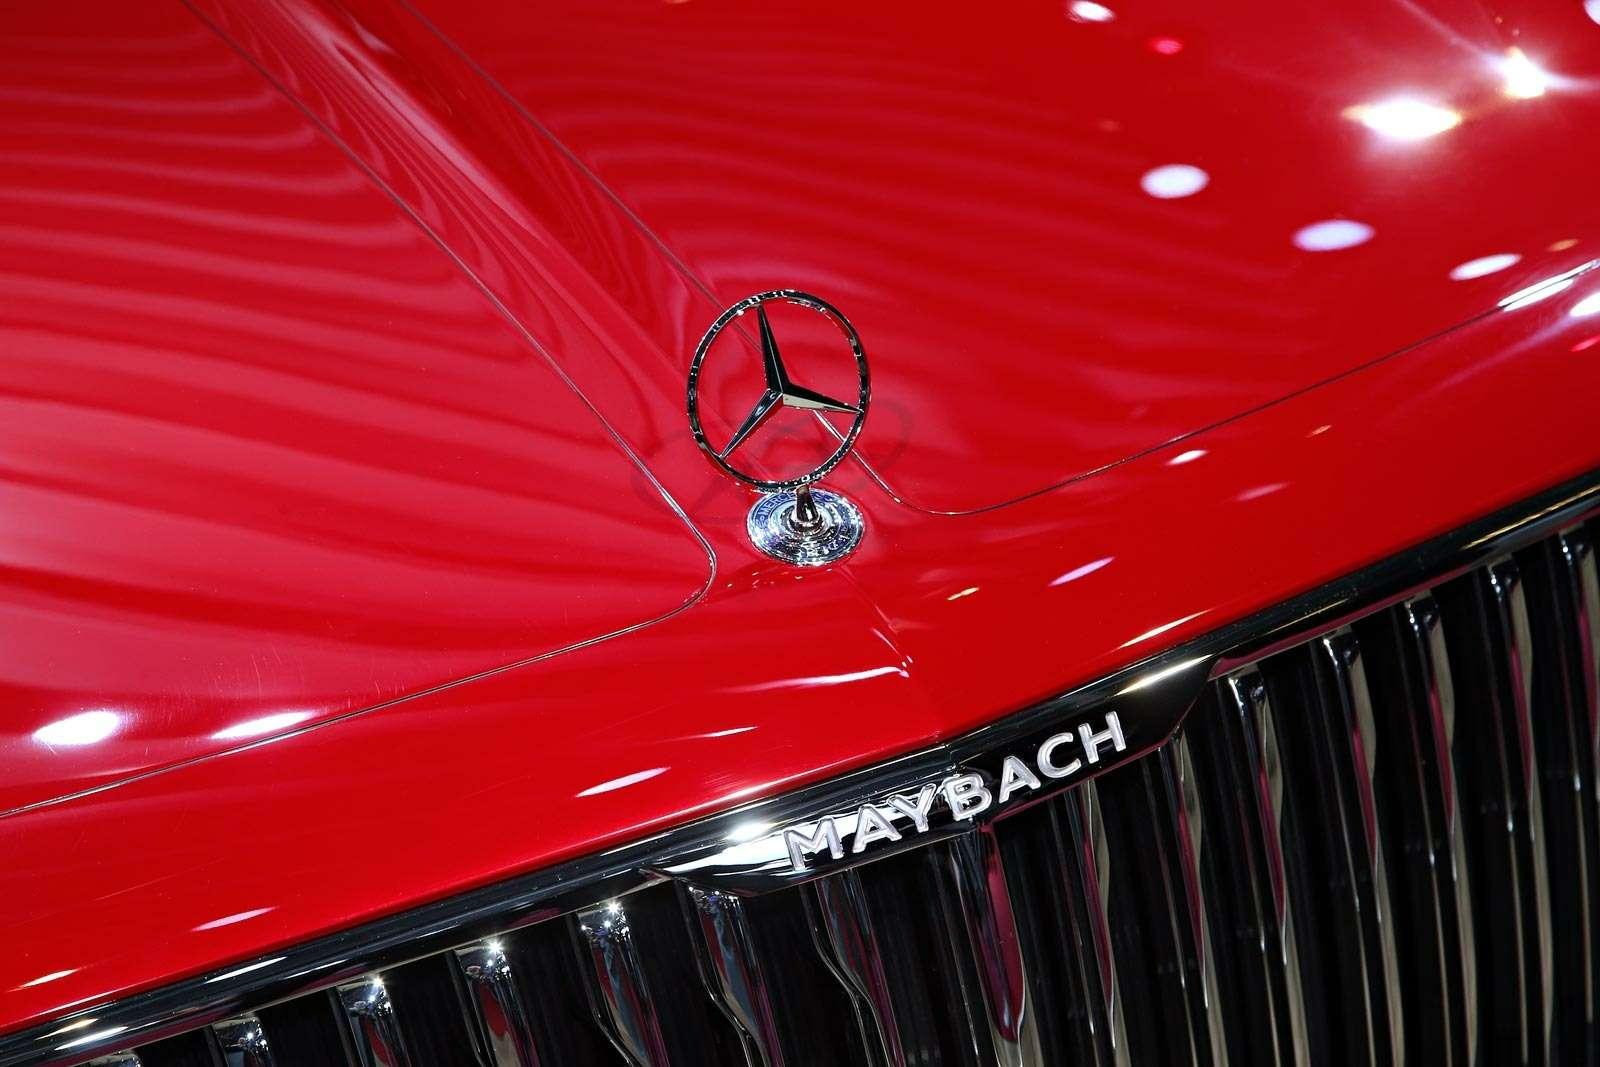 Самый красивый автомобиль Парижа: Vision Mercedes-Maybach 6завоевывает сердца— фото 643574